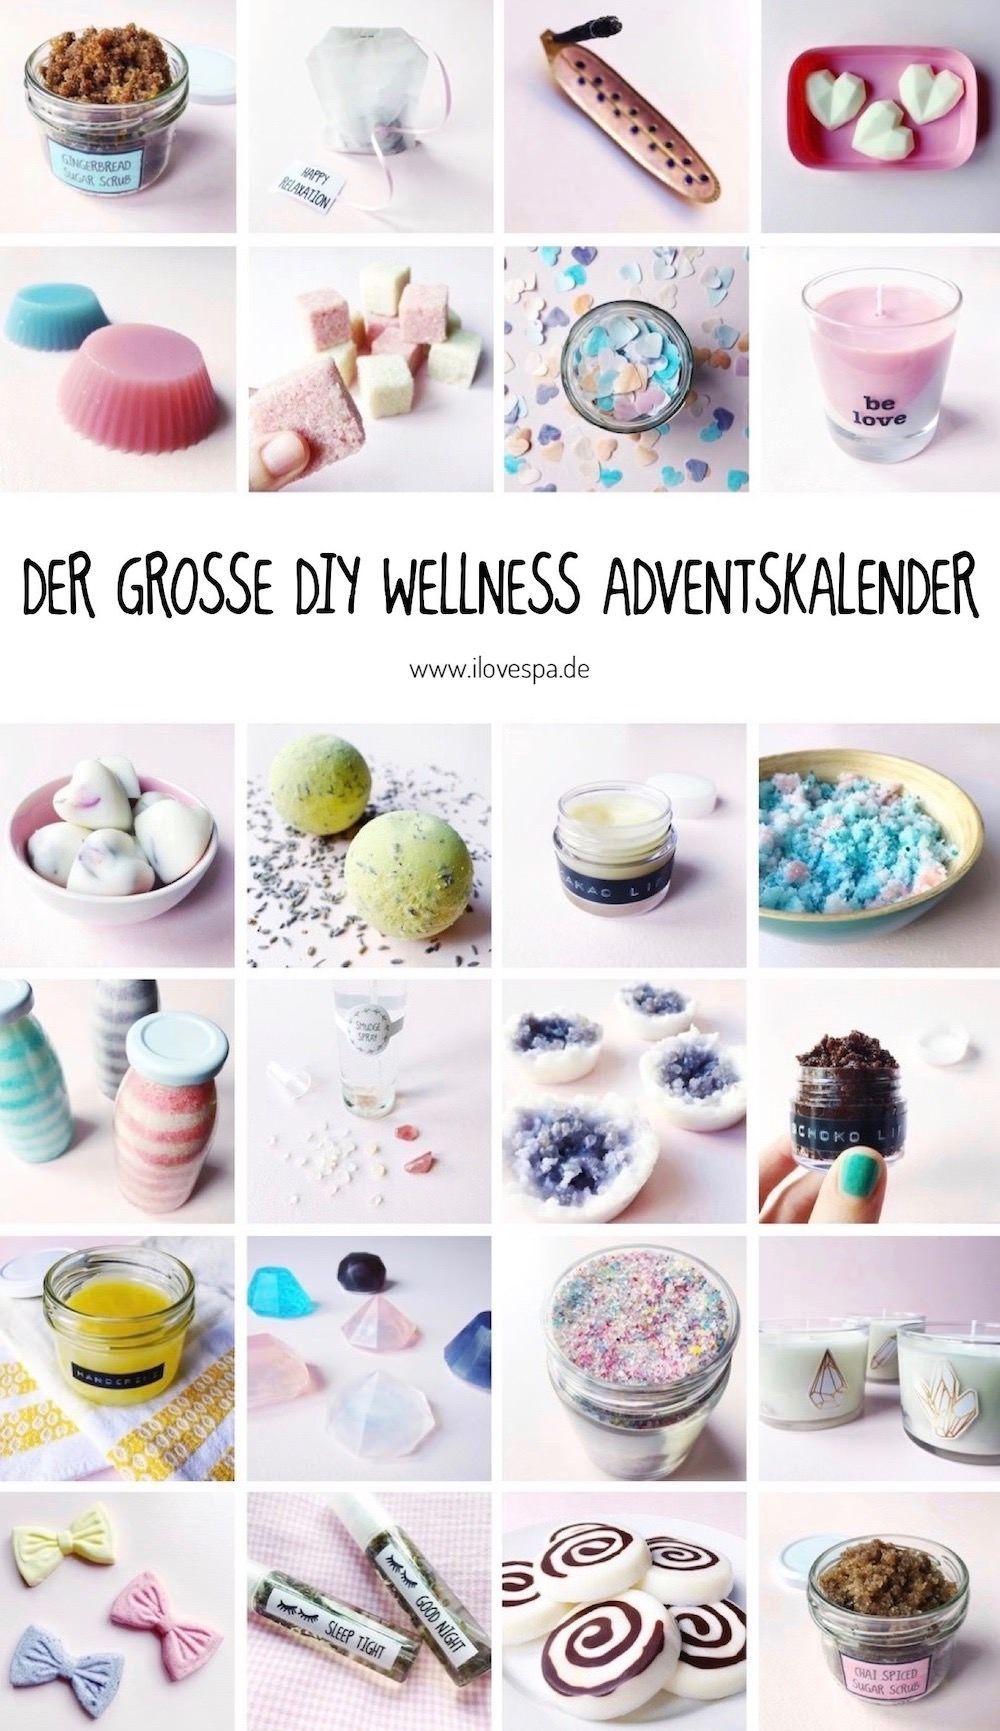 Der große DIY Wellness Adventskalender 24 DIY Wellness